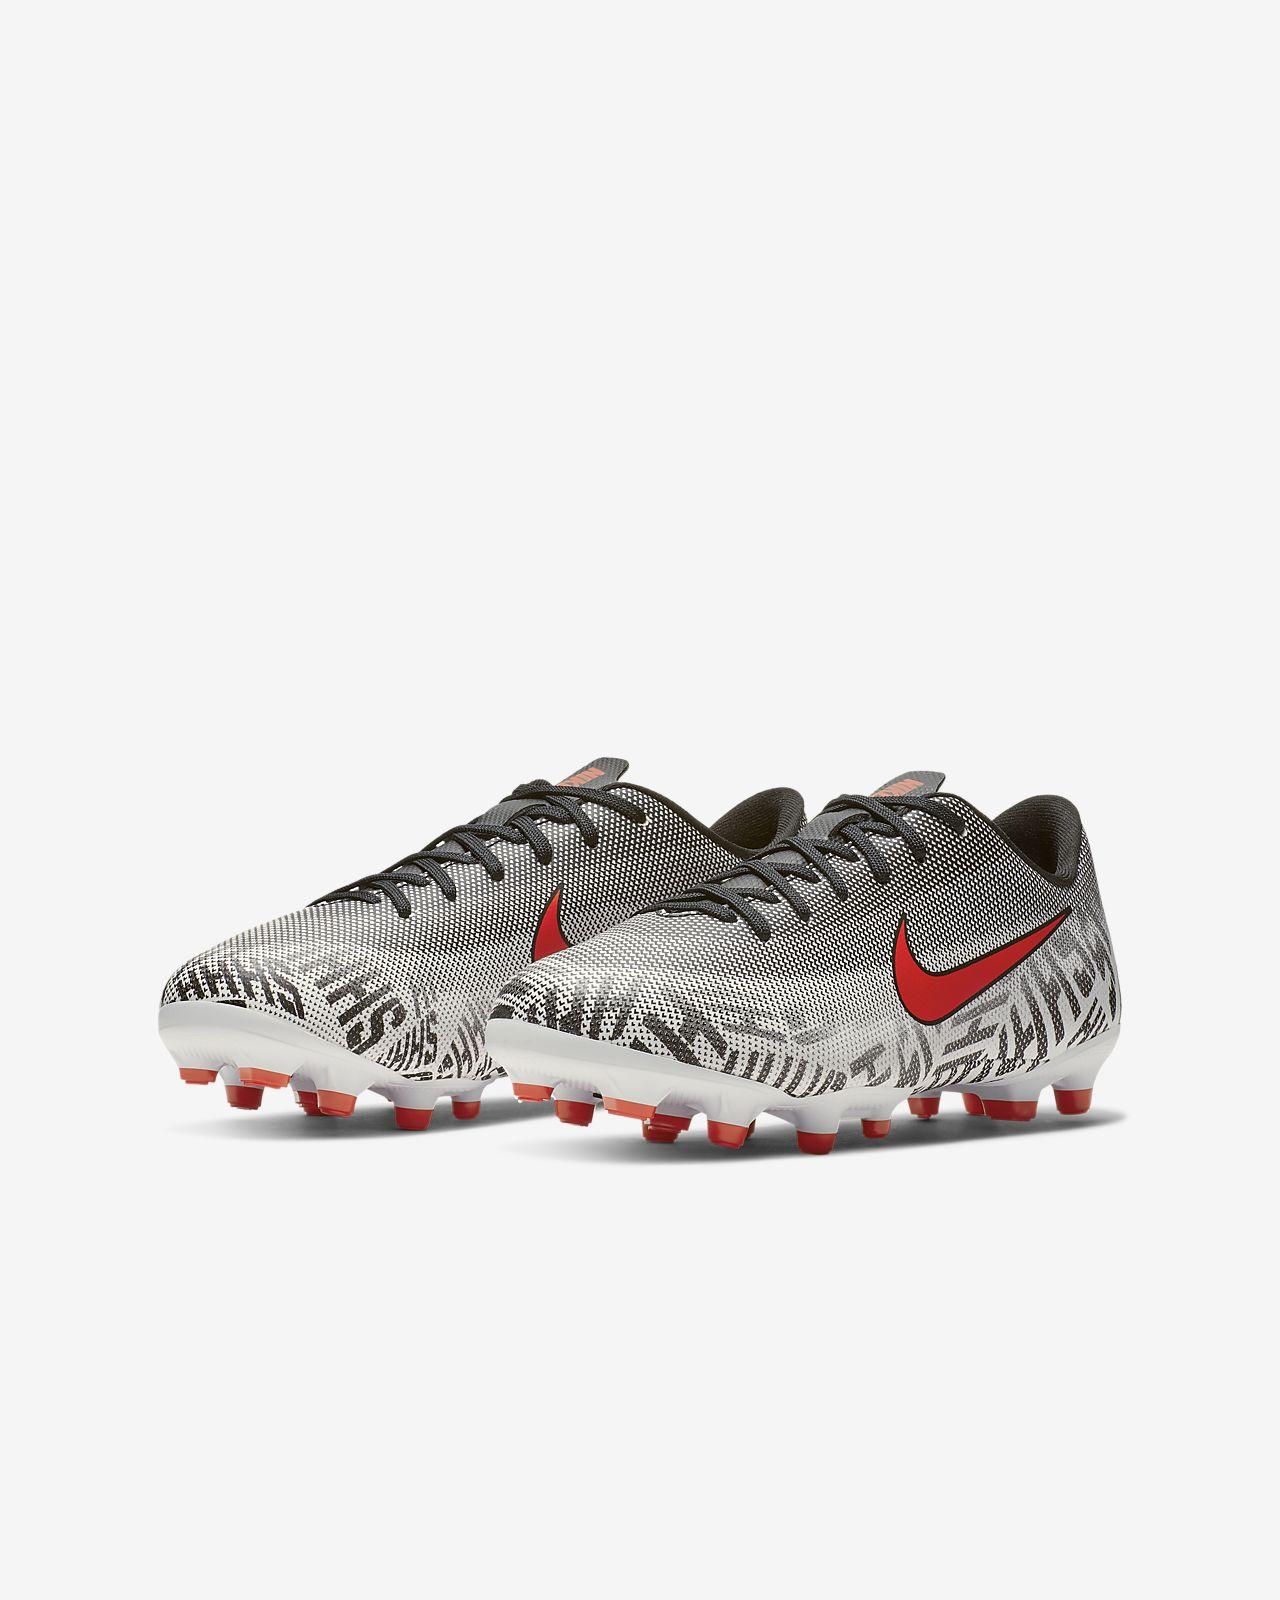 b5795d9e3 ... Nike Jr. Mercurial Vapor XII Academy Neymar Jr Younger/Older Kids' Multi -